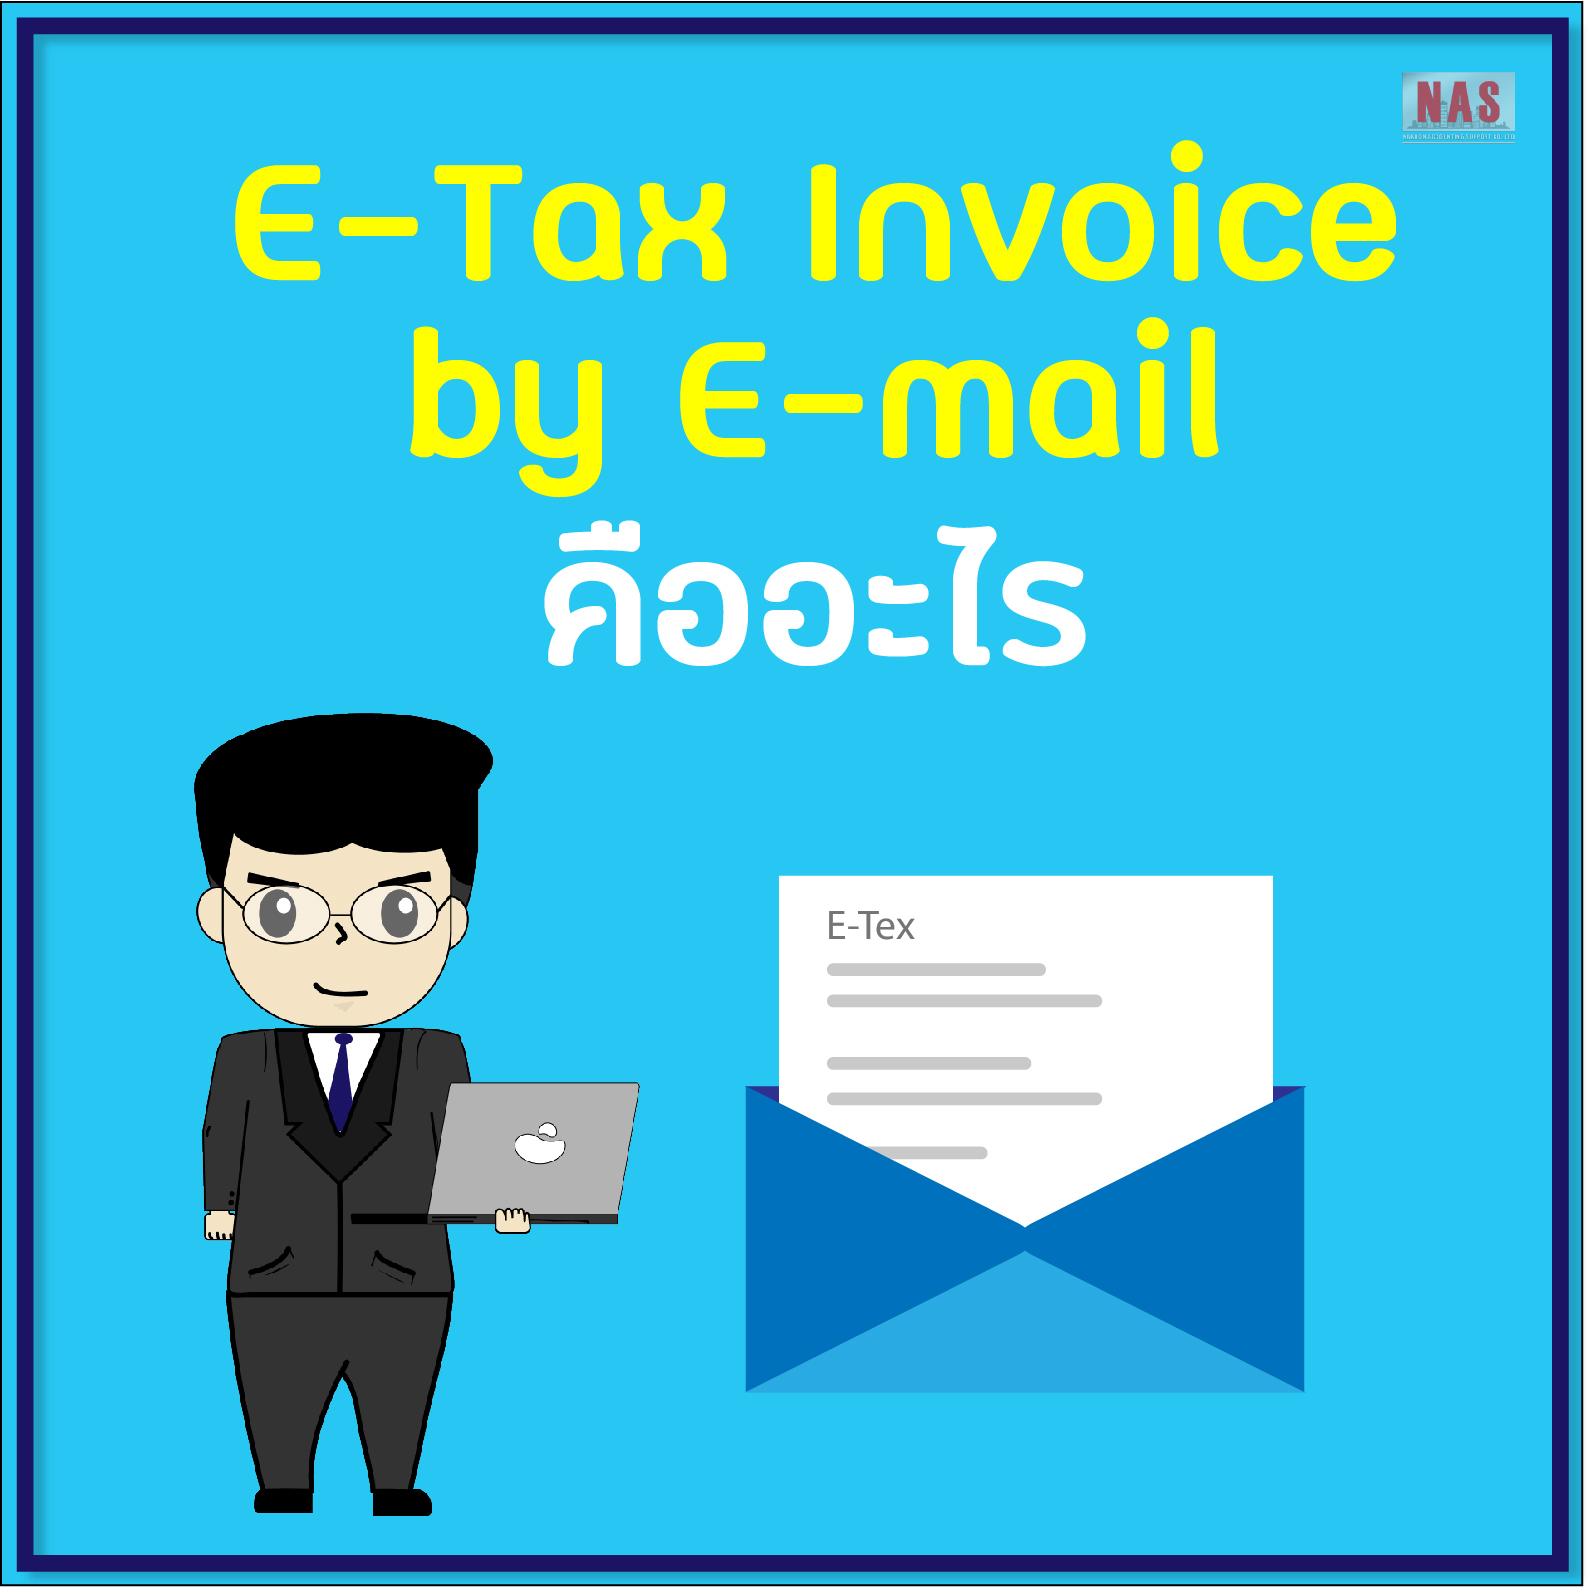 E-Tax Invoice by E-mail คืออะไร